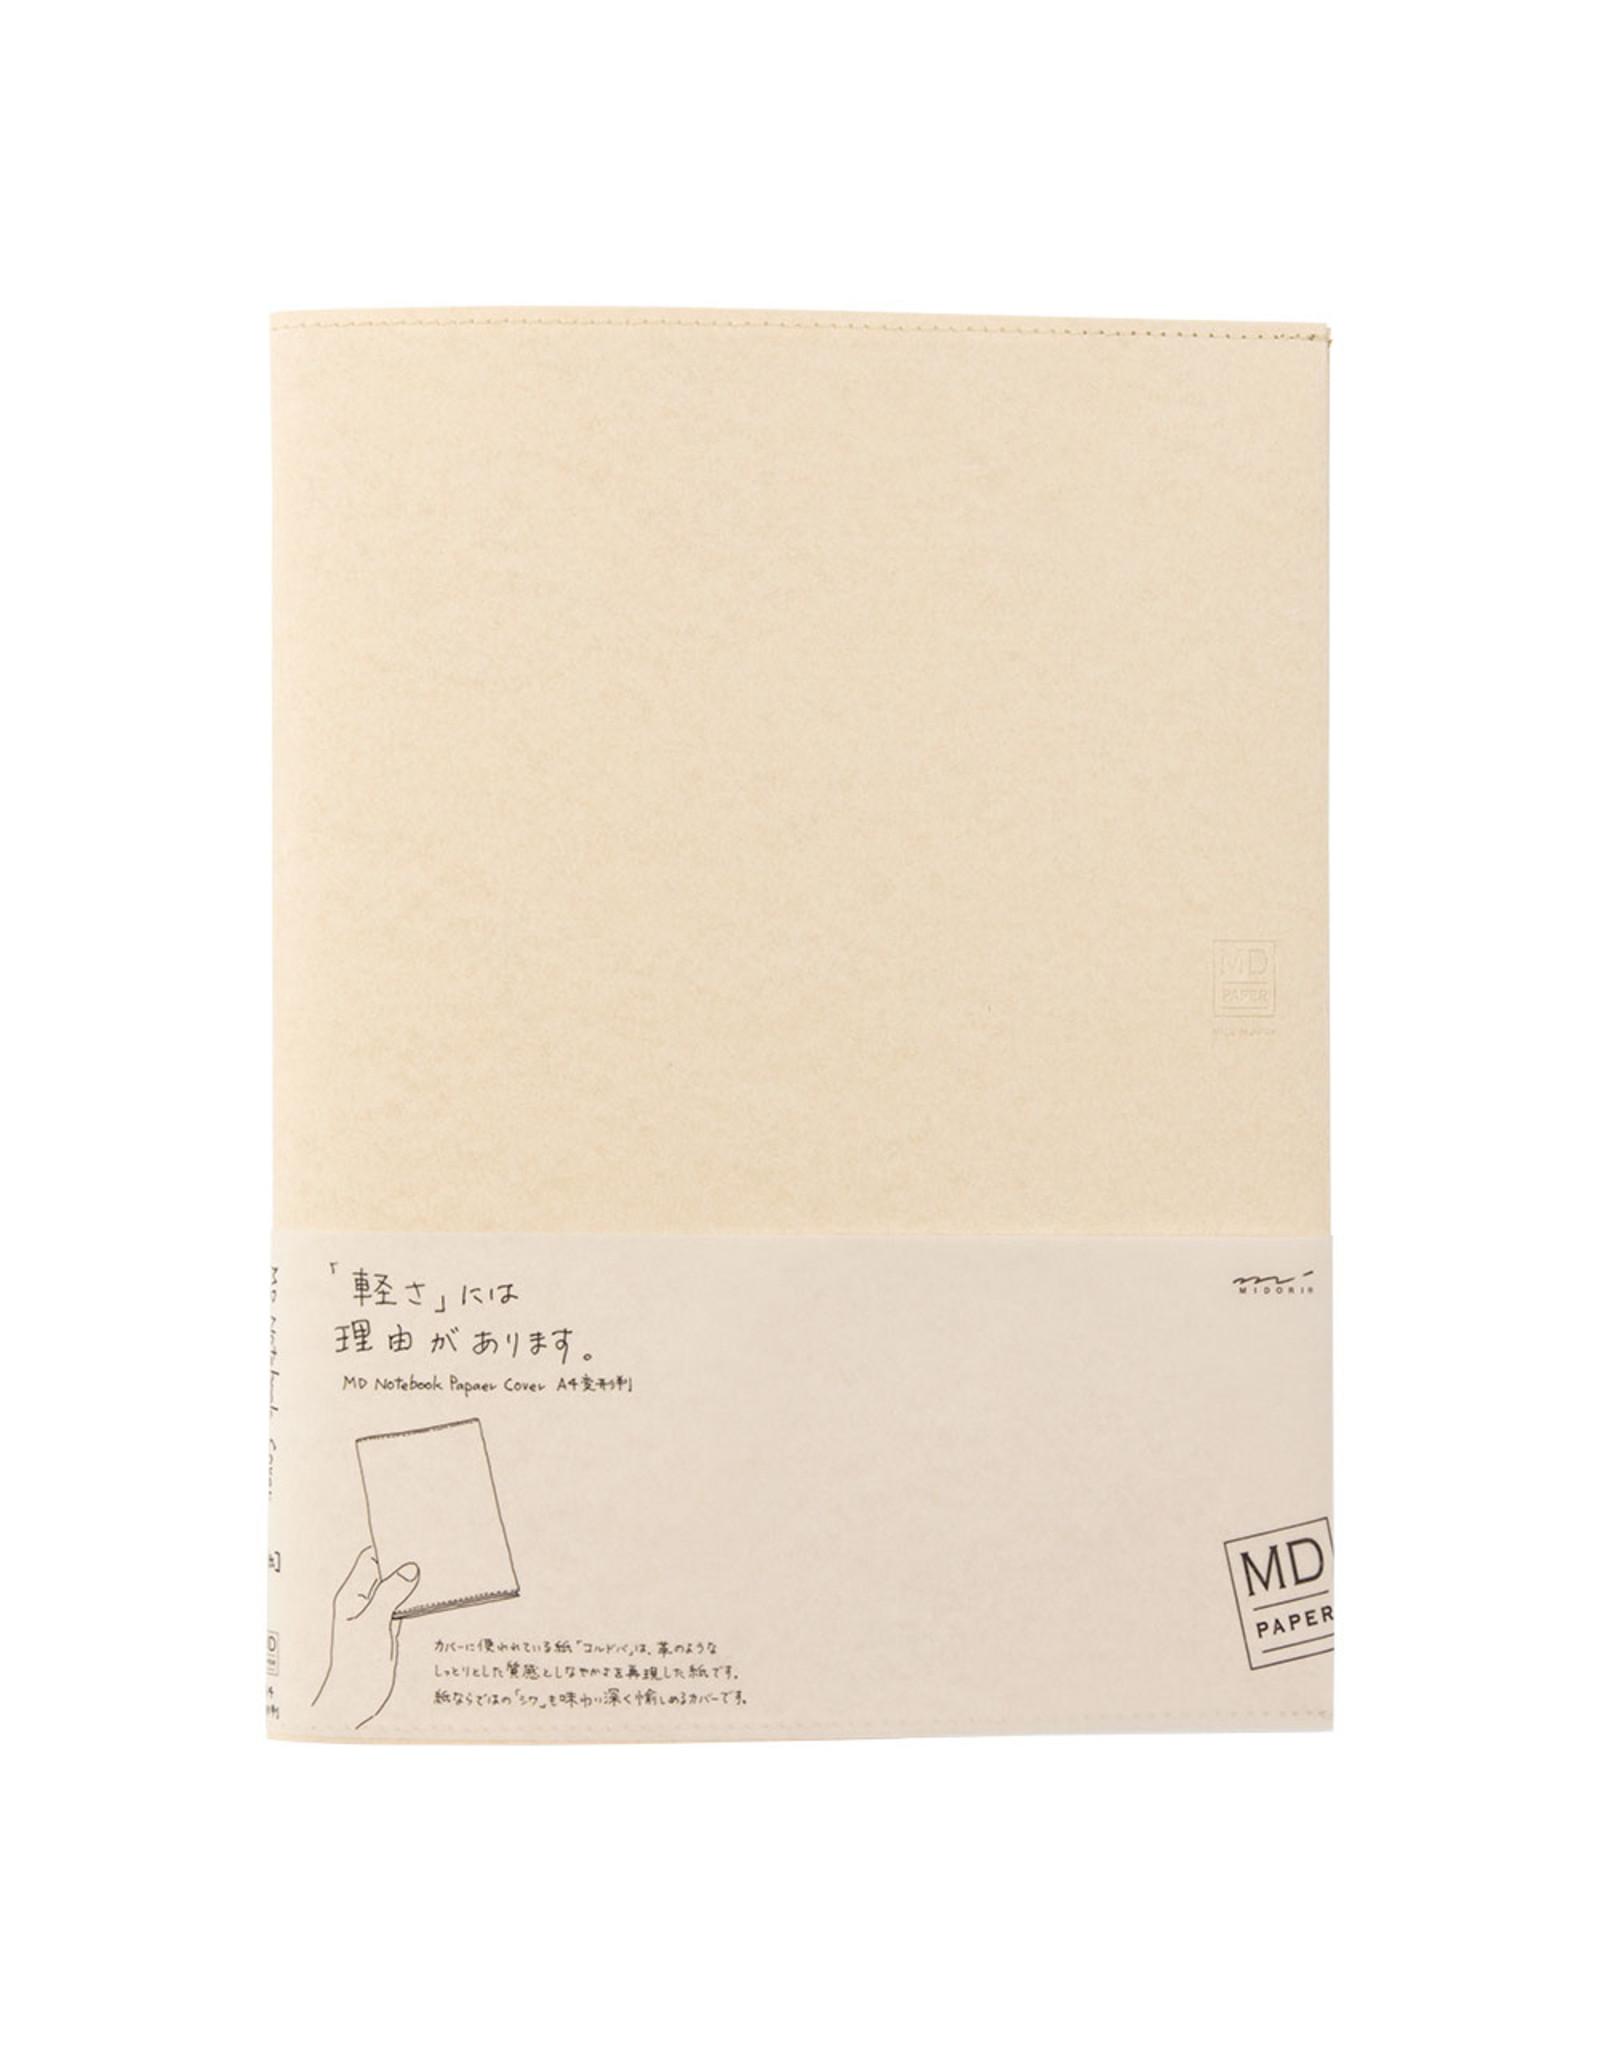 Designphil Inc. MD PAPER COVER PINK